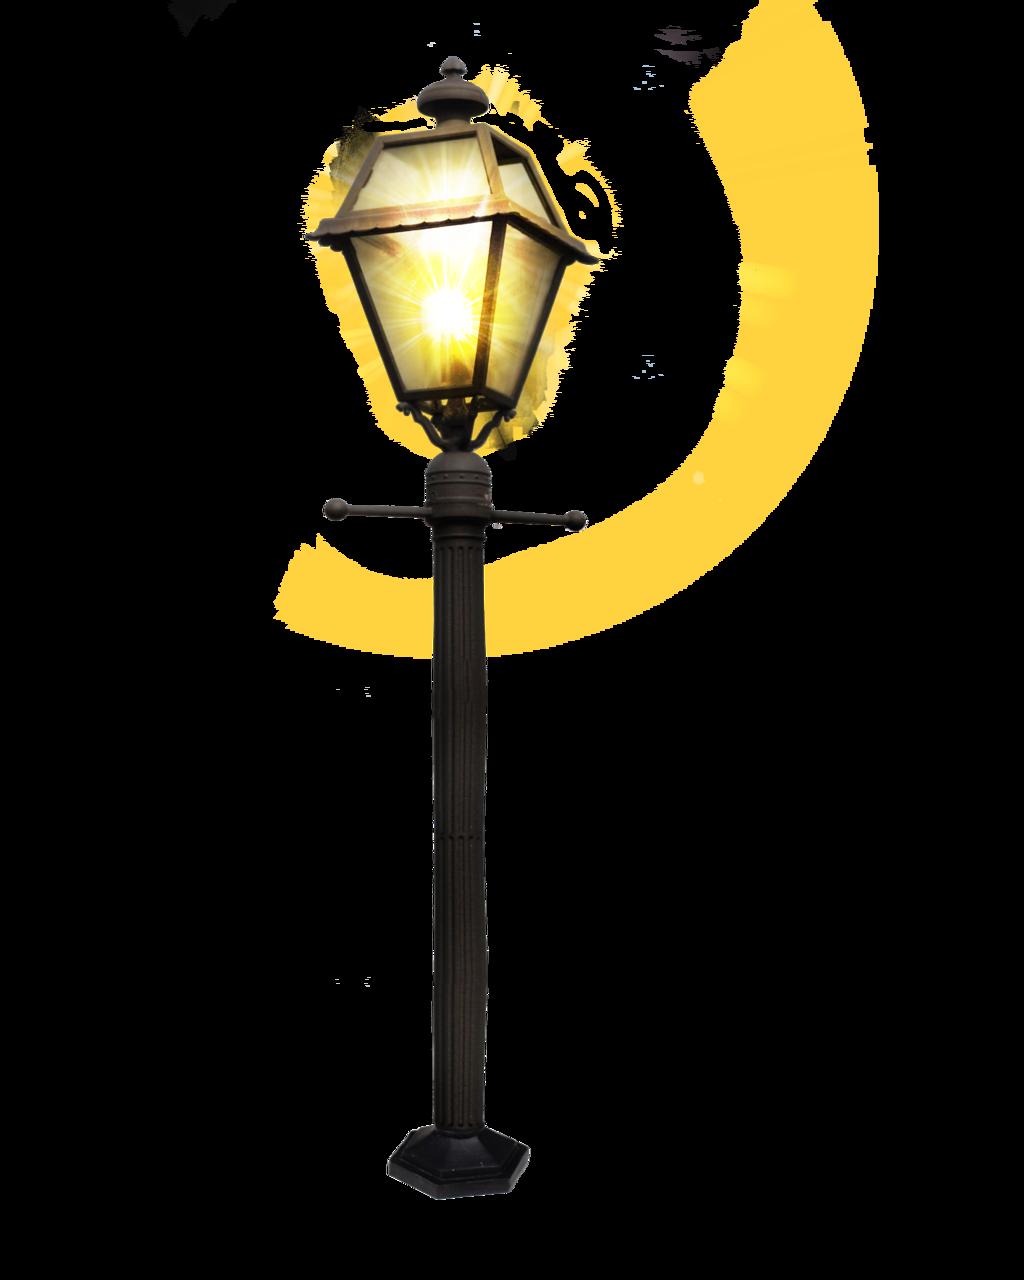 Lamp High-Quality PNG - Cute Lamb PNG HD